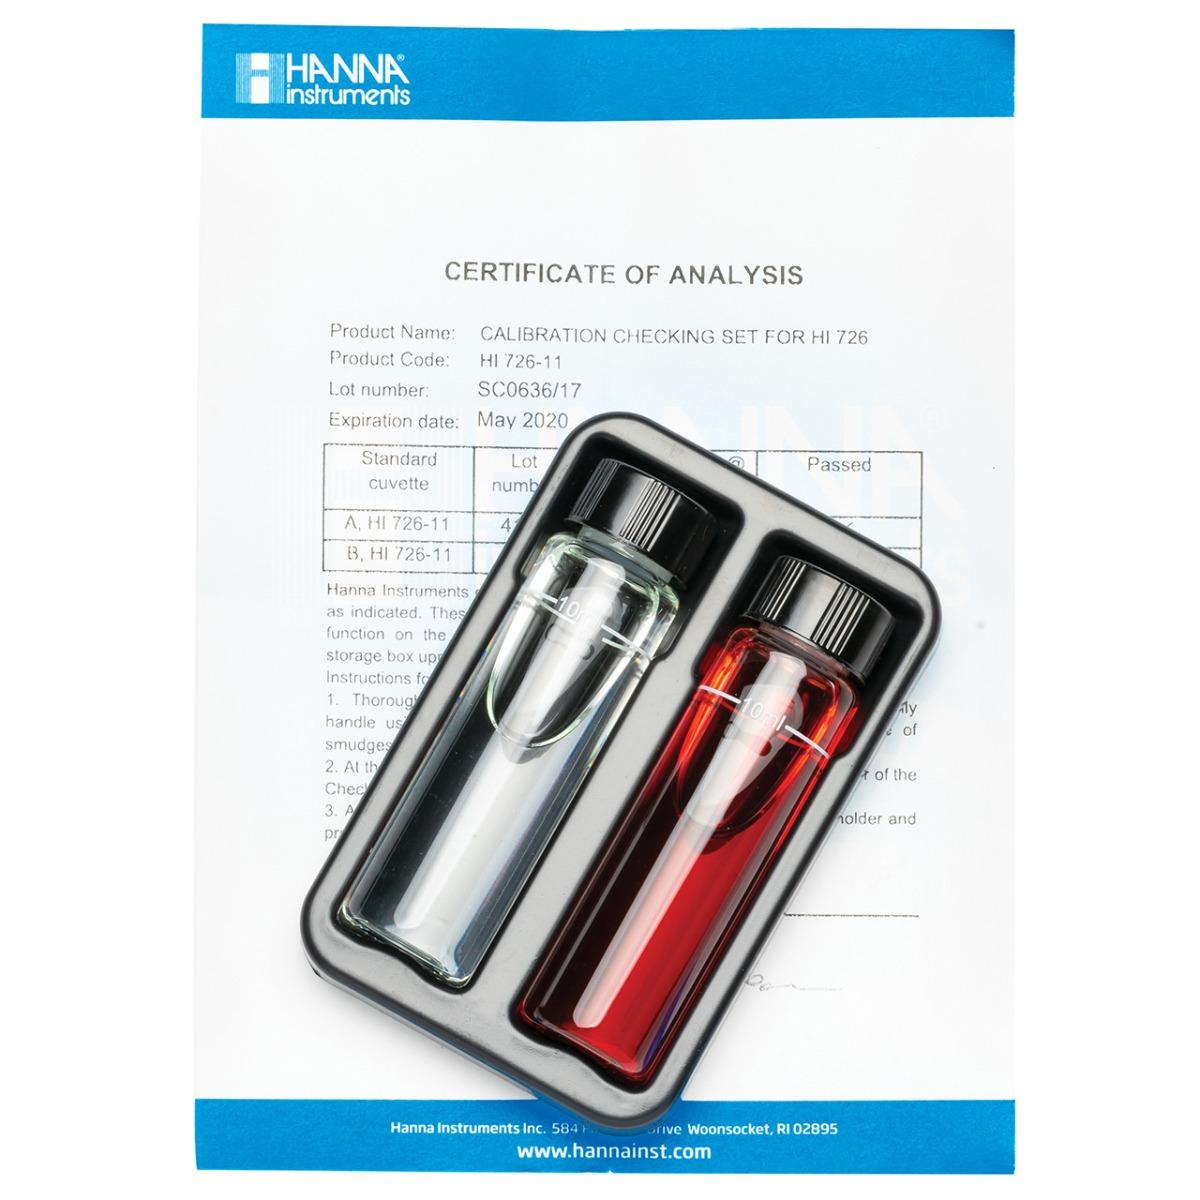 HI726-11 Nickel High Range Checker® HC Calibration Set